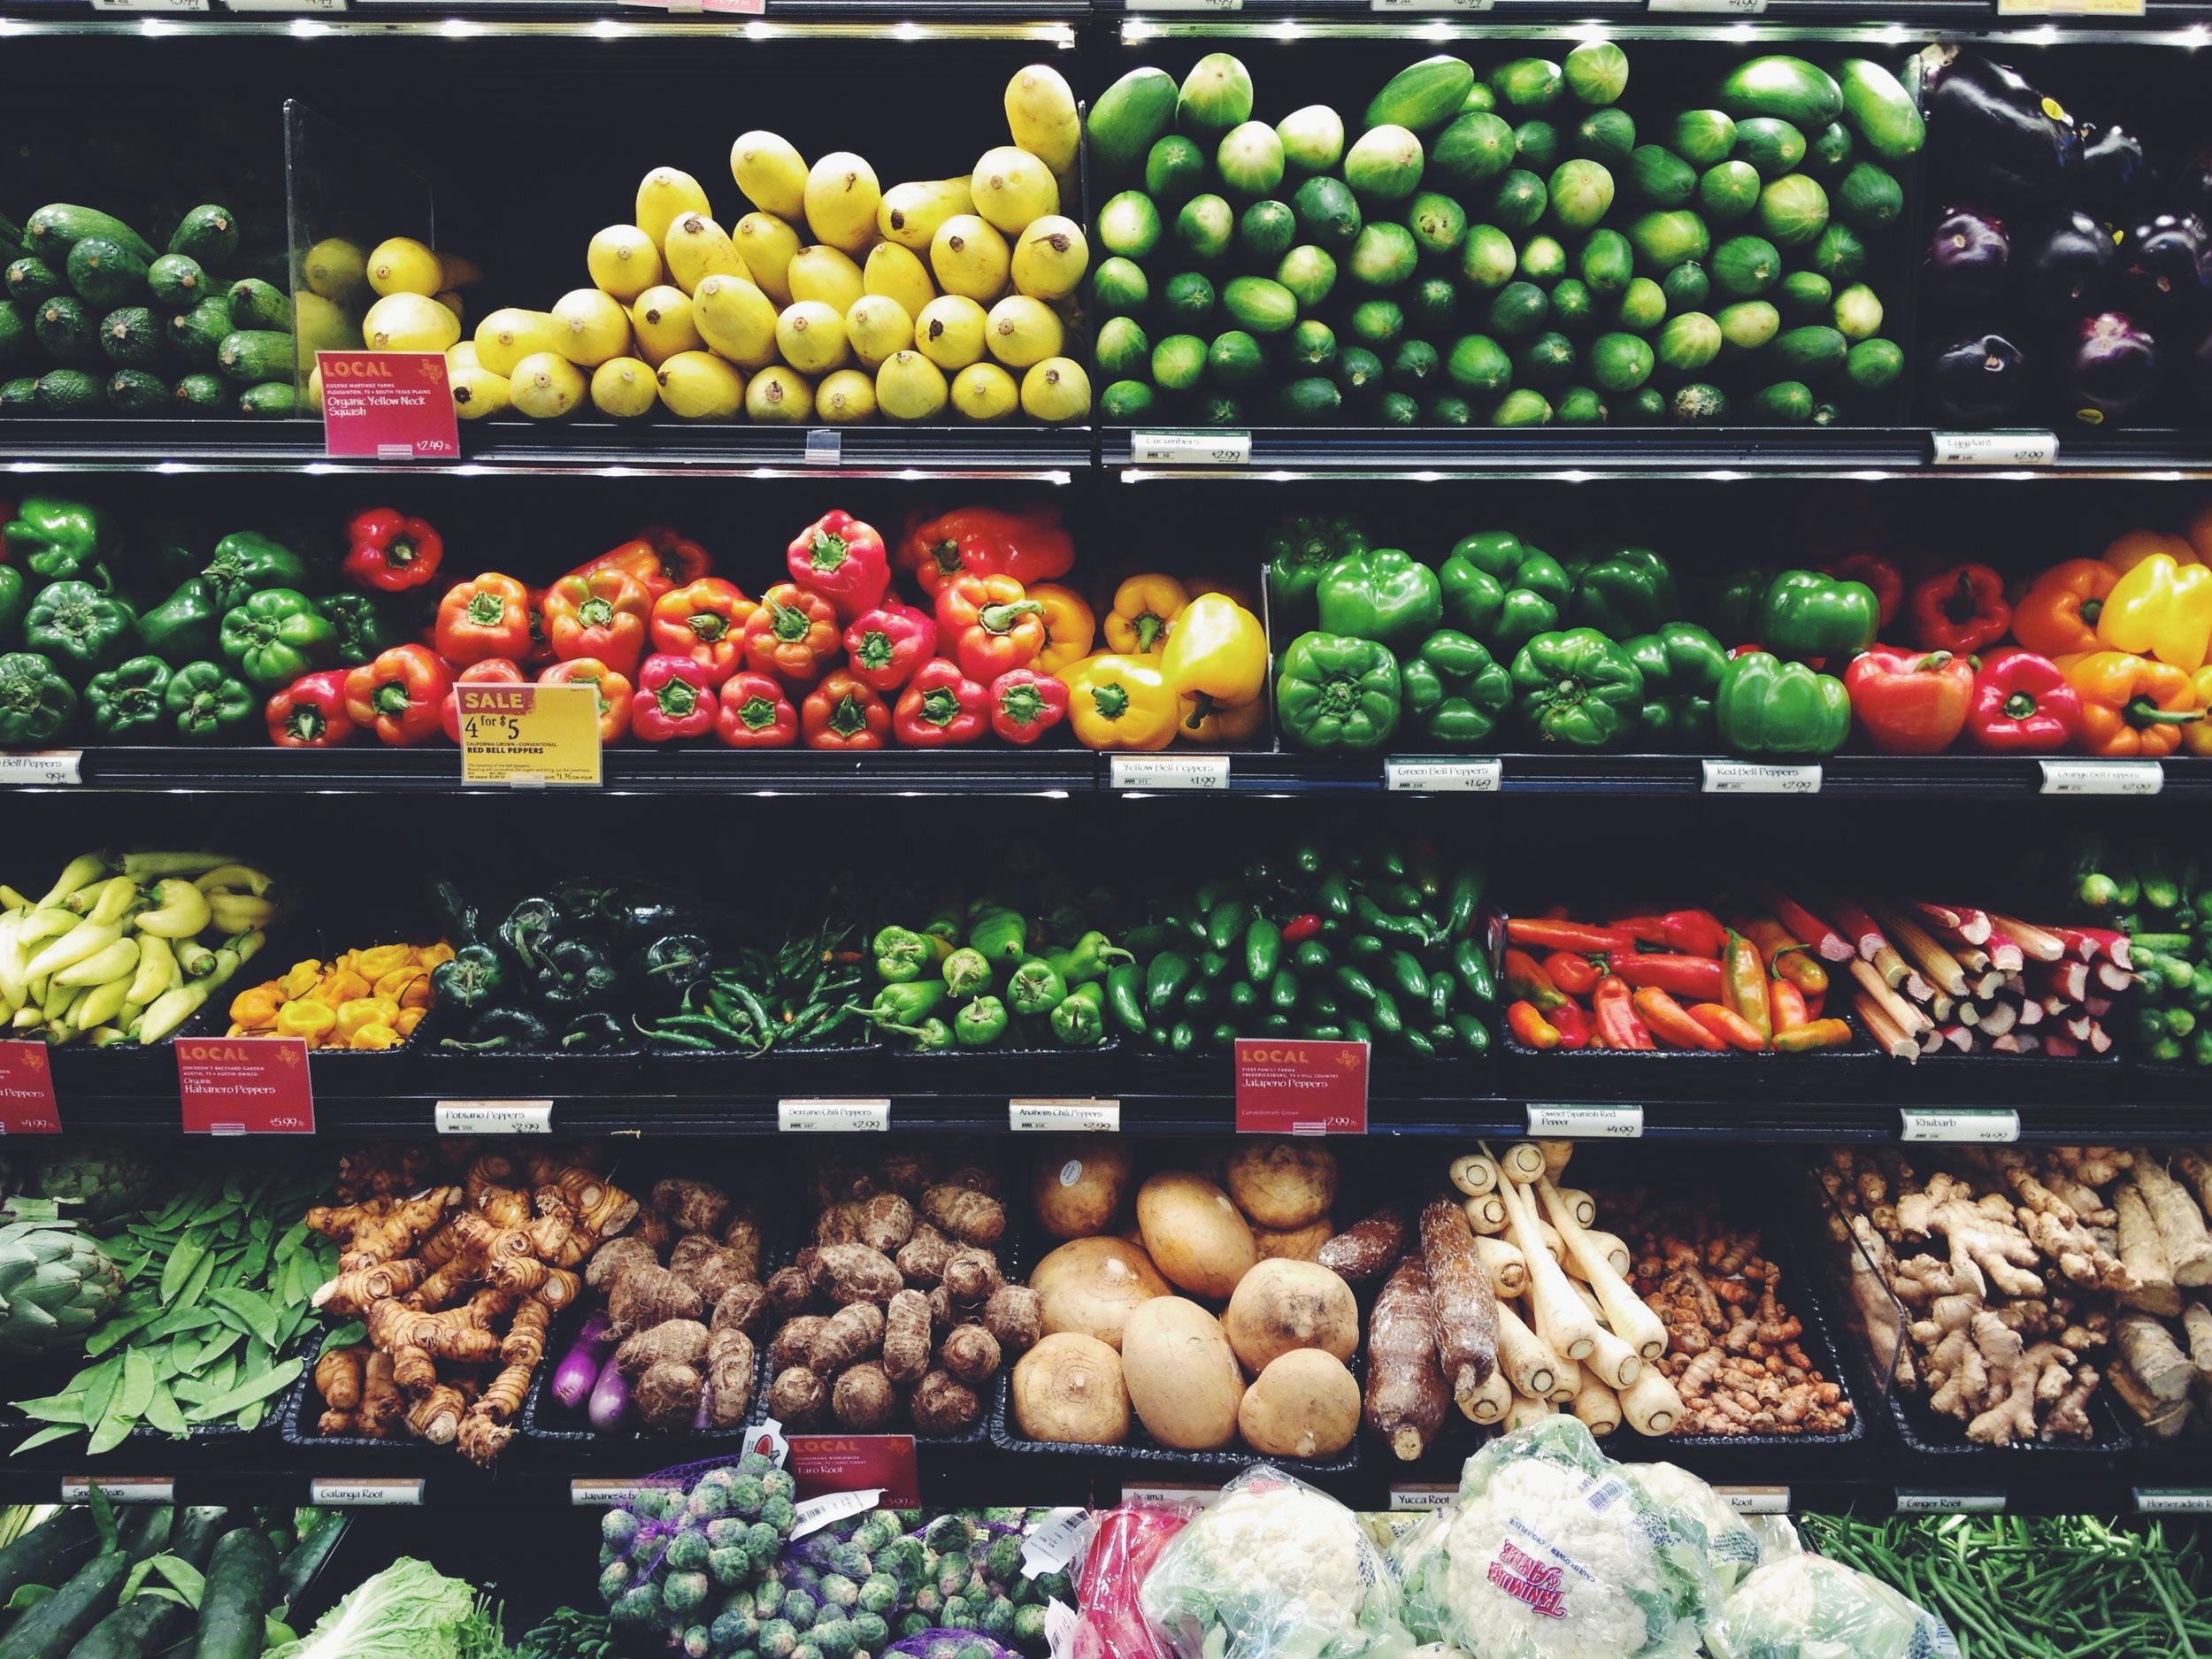 Organic produce aisle, I missed you so! Back in 'Muhrica.